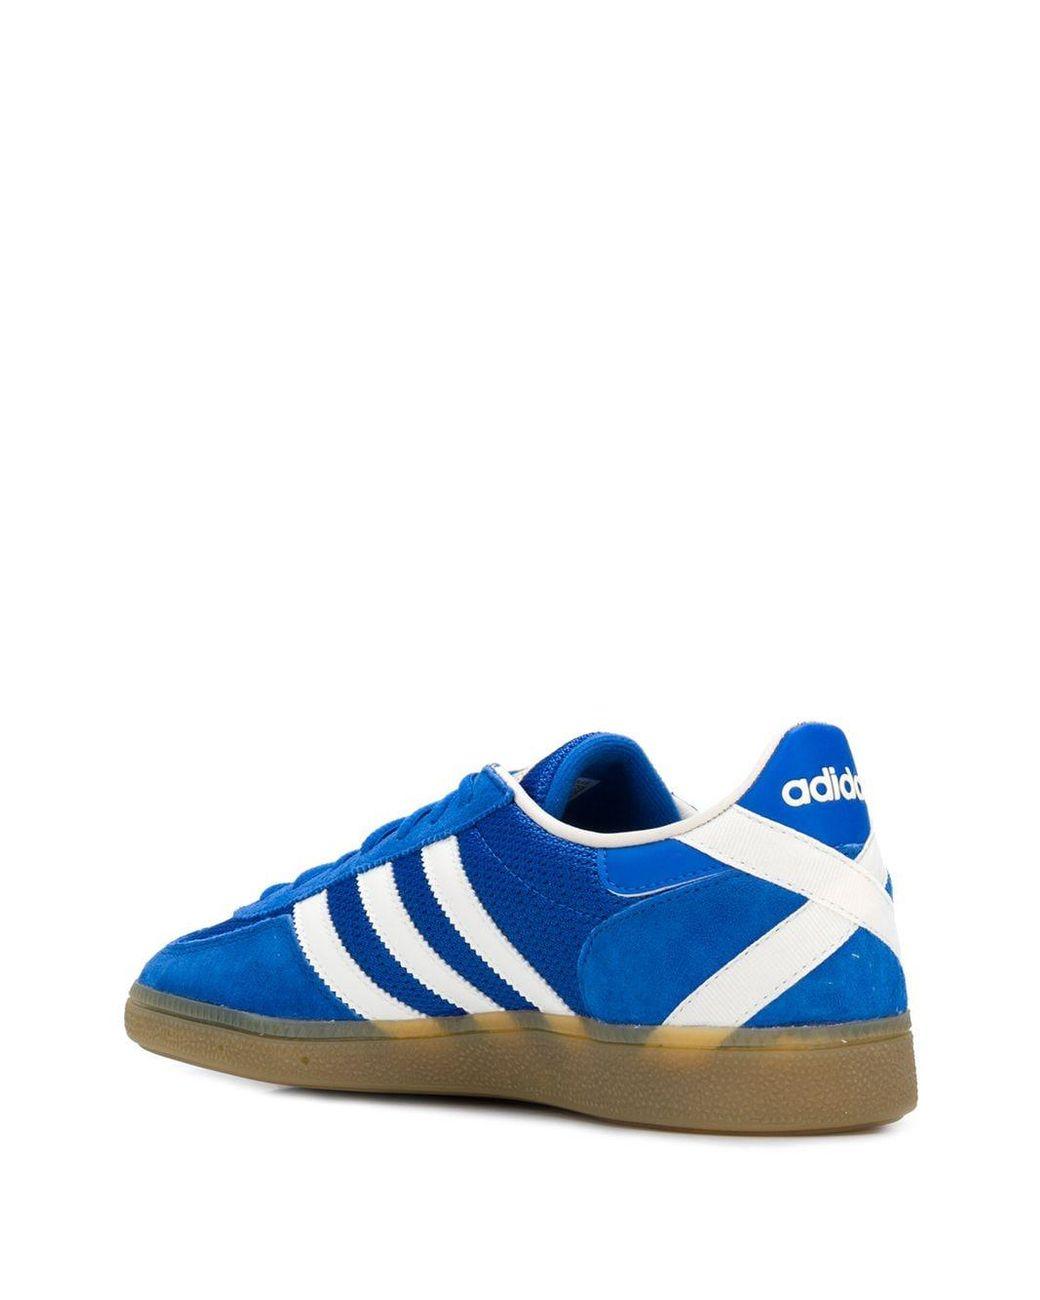 Adidas Adidas Originals Handball Spezial Sneakers Farfetch